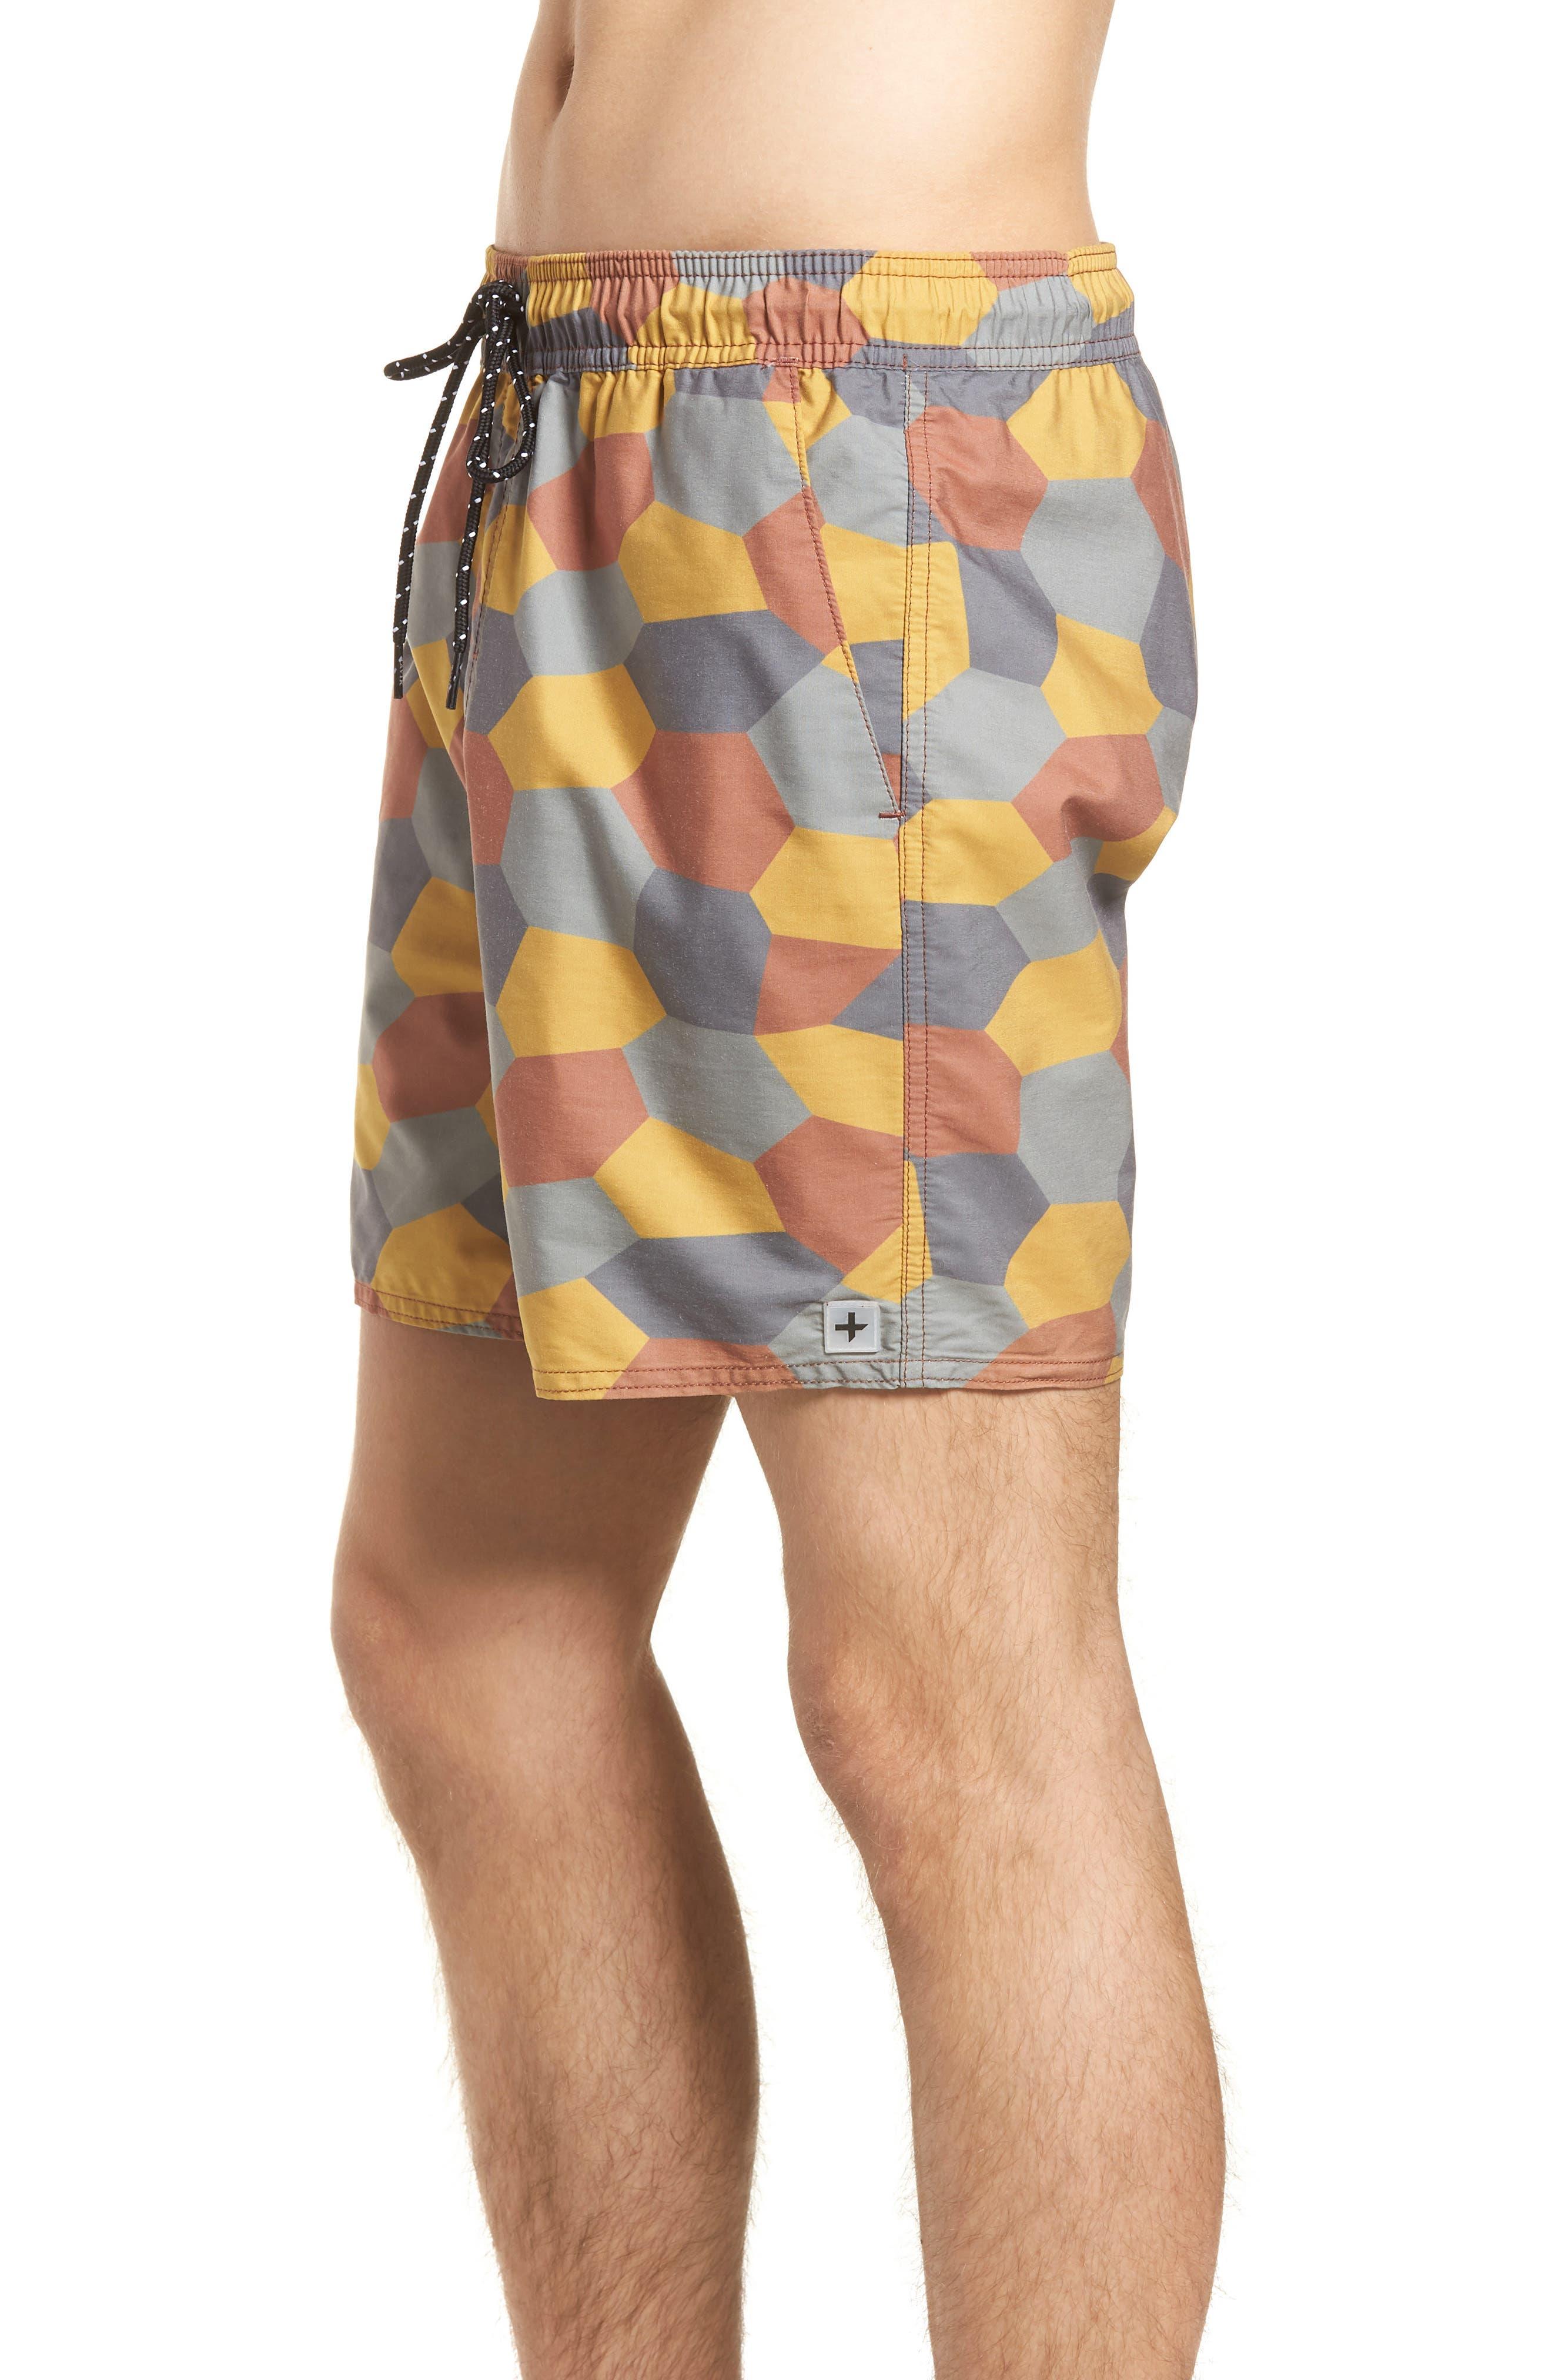 Belmont Pool Shorts,                             Alternate thumbnail 3, color,                             Coastal Orange Geo Camo